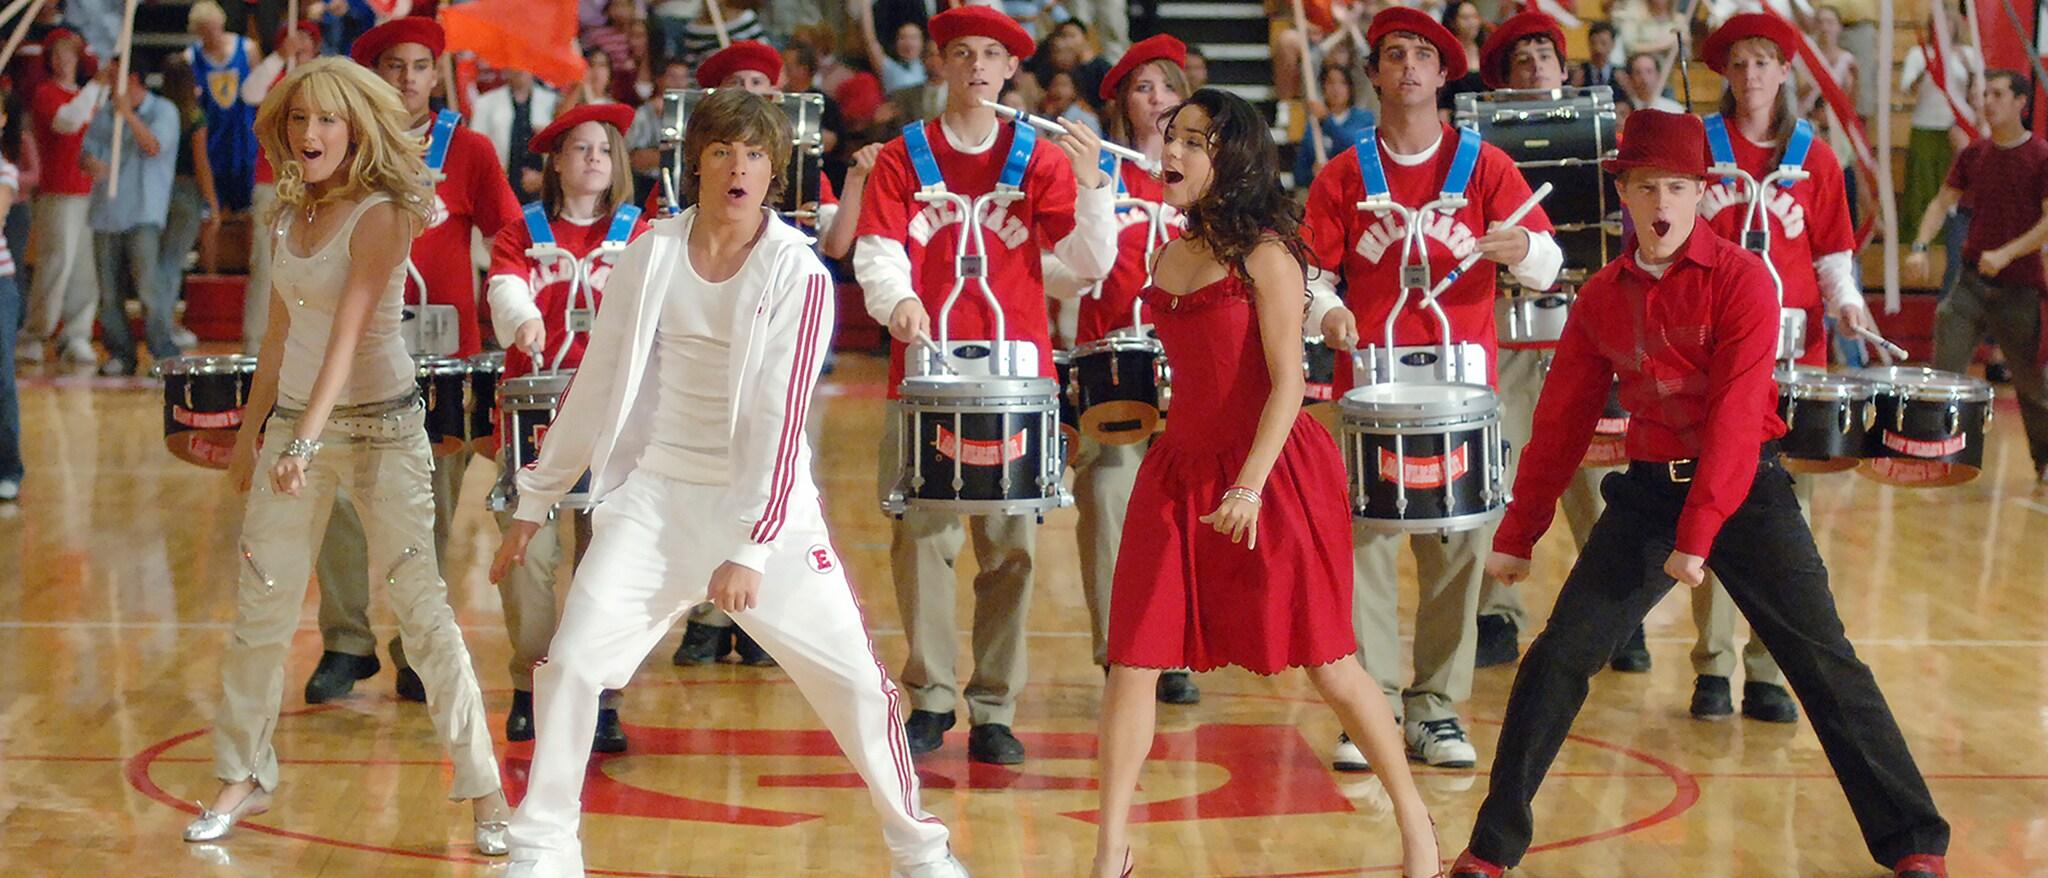 High School Musical Hero